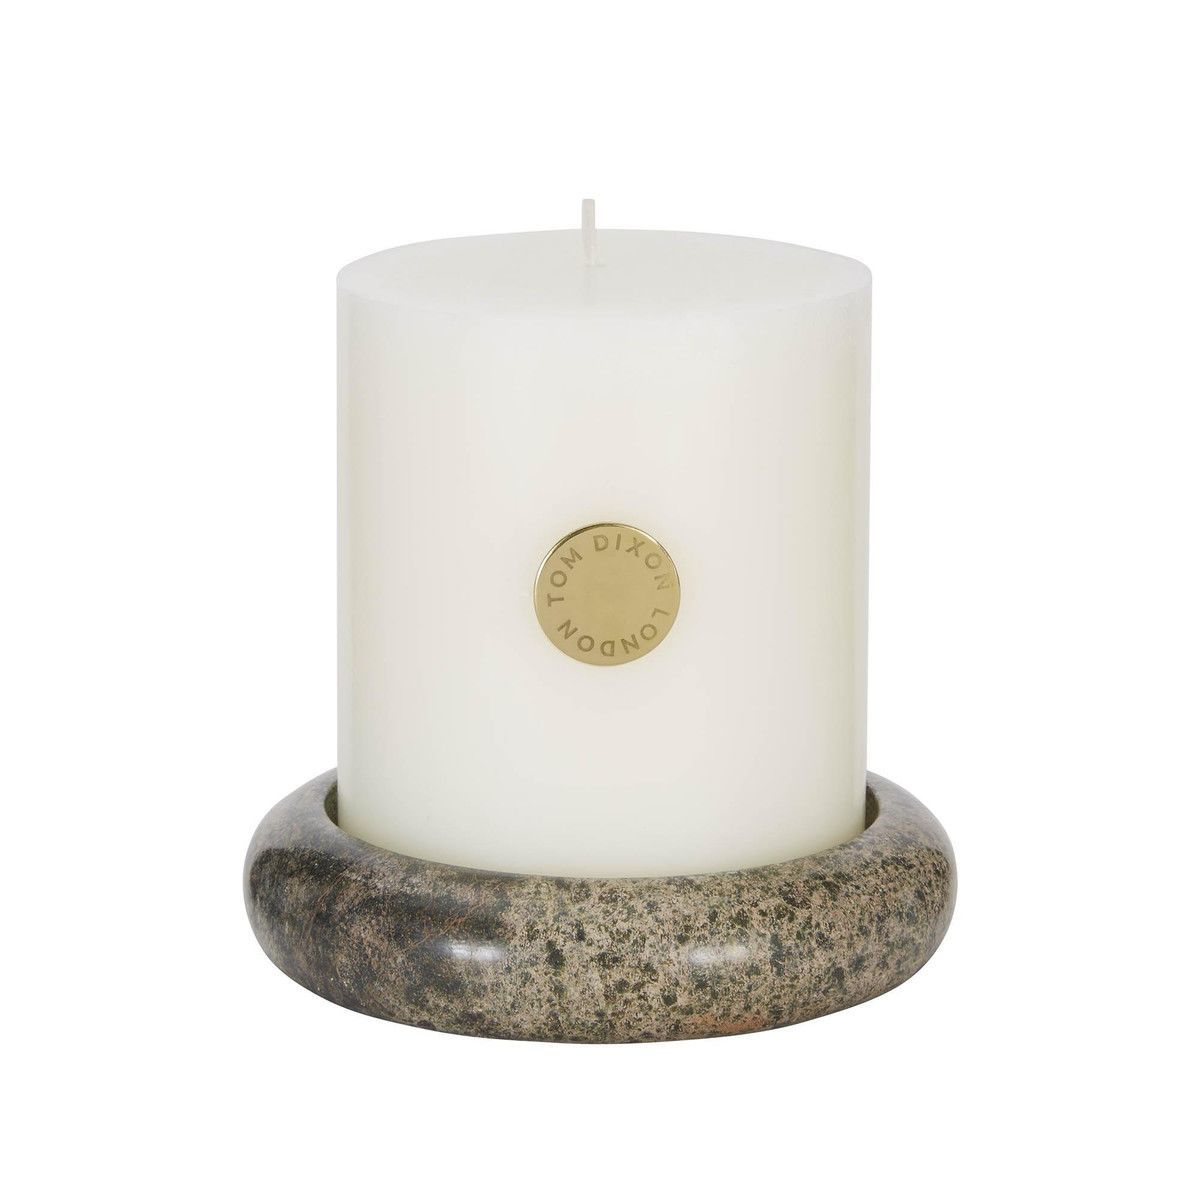 materialism stone pillar candle tom dixon candle. Black Bedroom Furniture Sets. Home Design Ideas